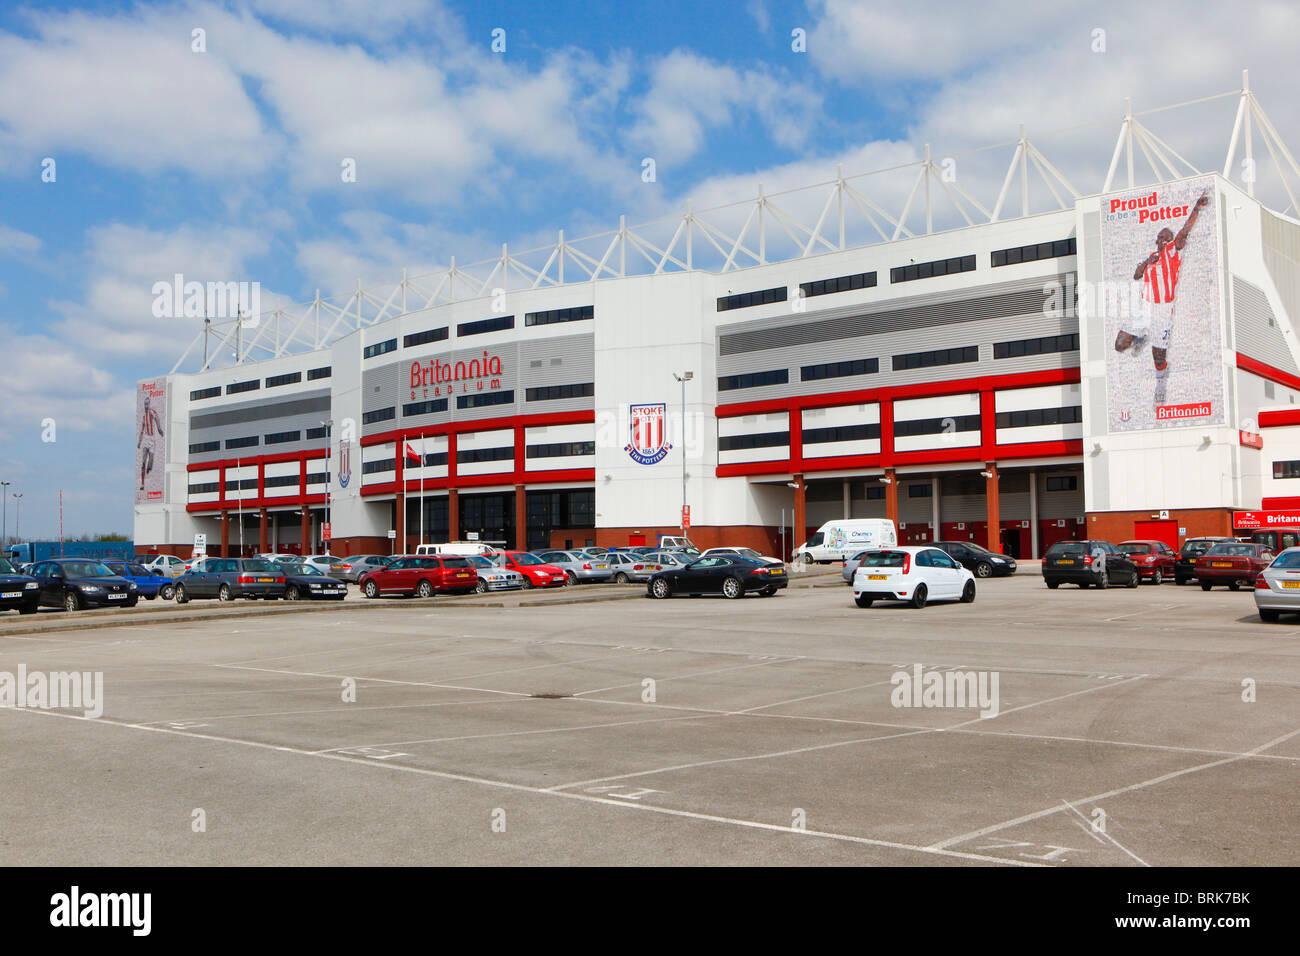 The Britannia Stadium, home of Stoke City Football Club. Stoke. - Stock Image